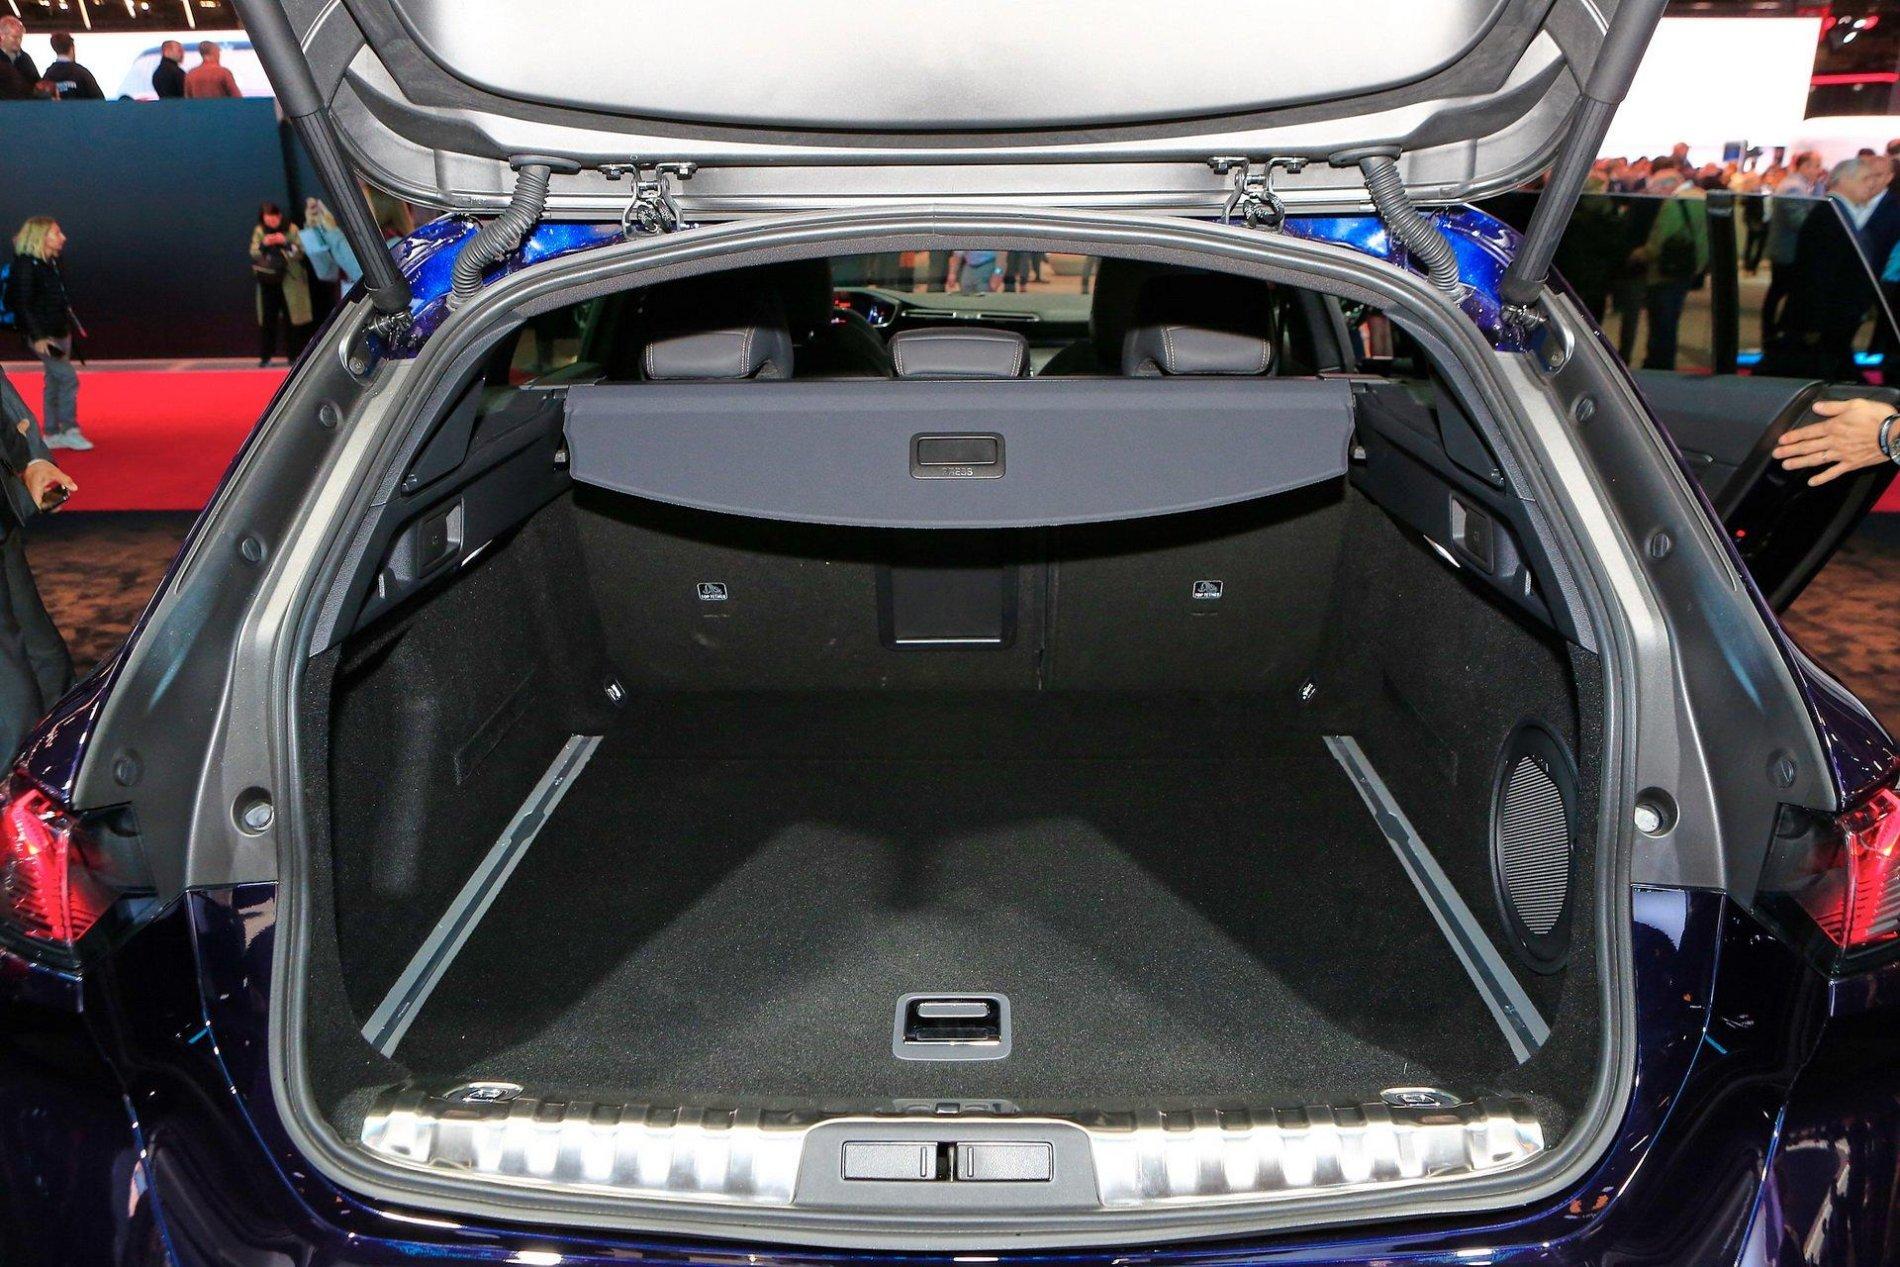 Peugeot 508 SW - Poze reale - Peugeot 508 SW - Poze reale